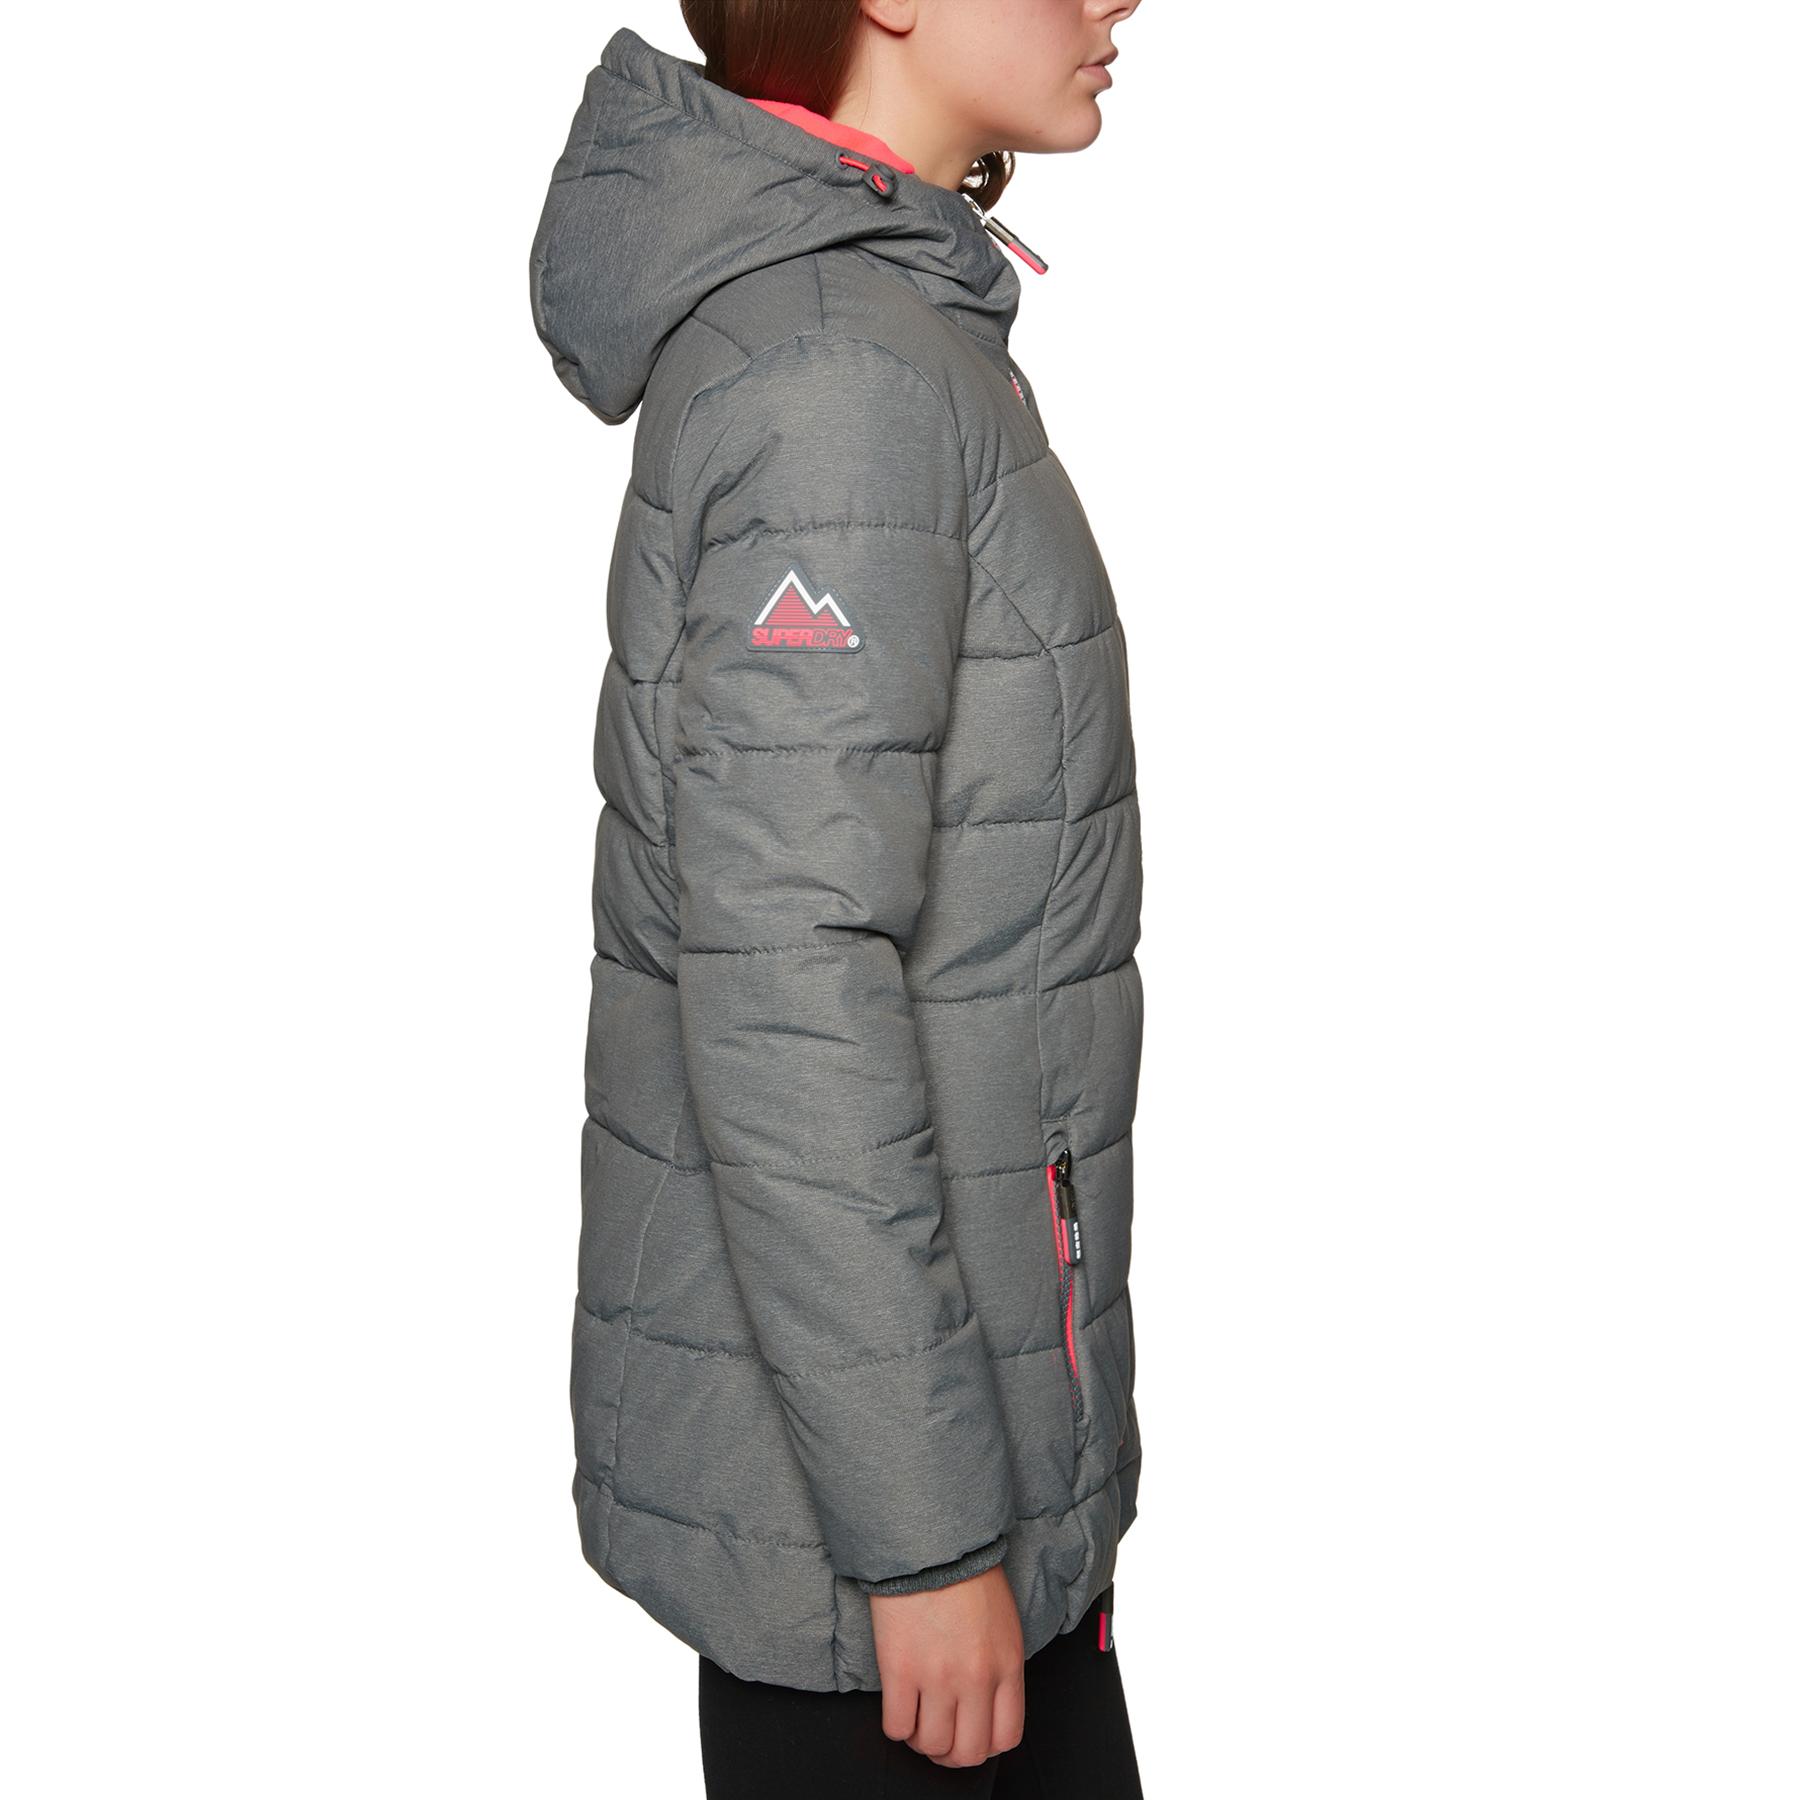 Superdry Sports Puffer Tall Womens Jacket pqSMULGzV